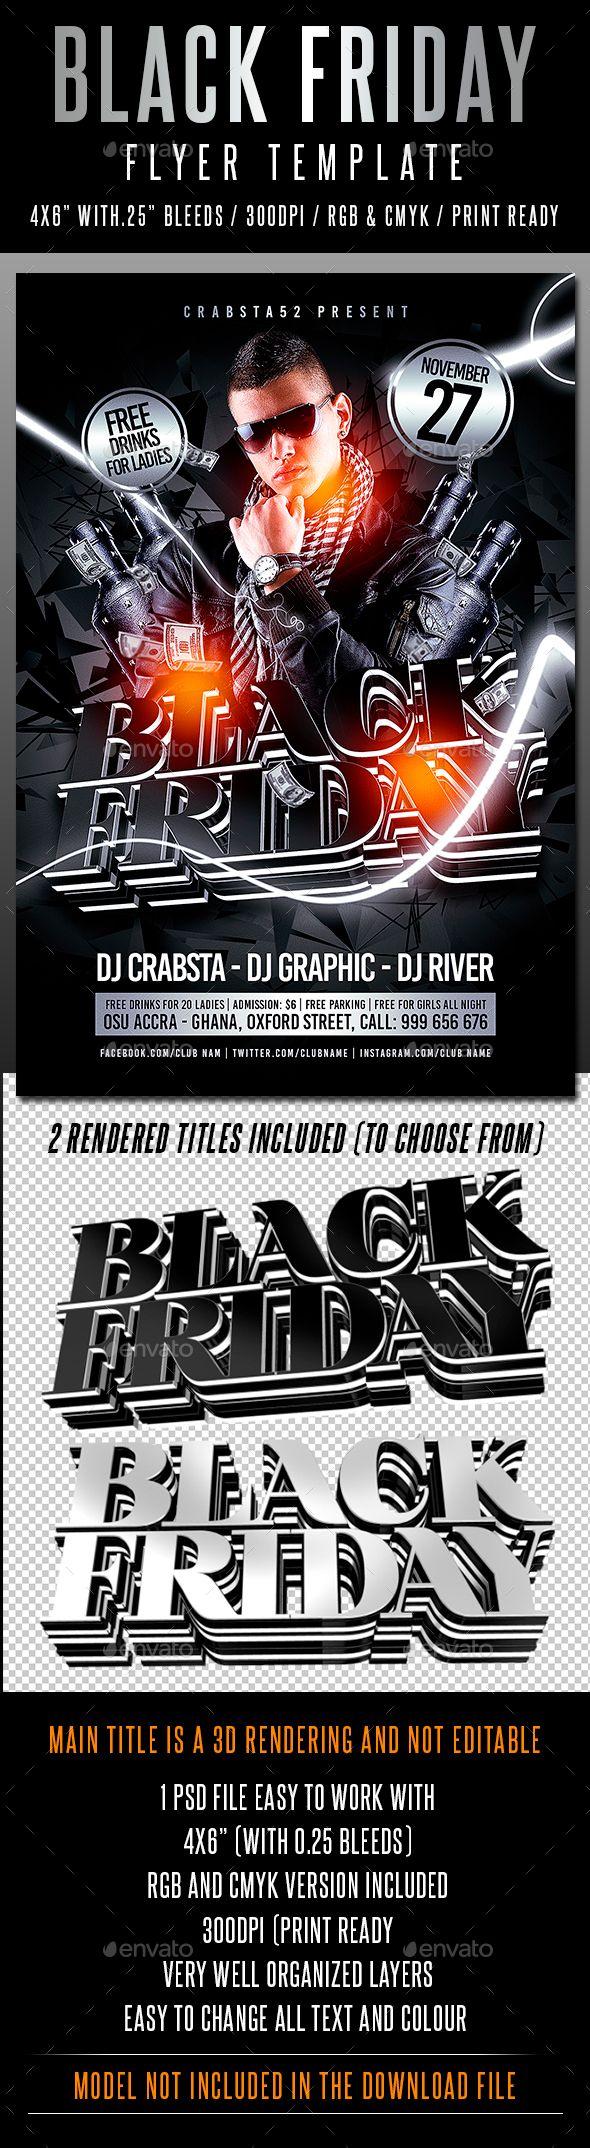 black friday flyer template photoshop psd nightclub all black